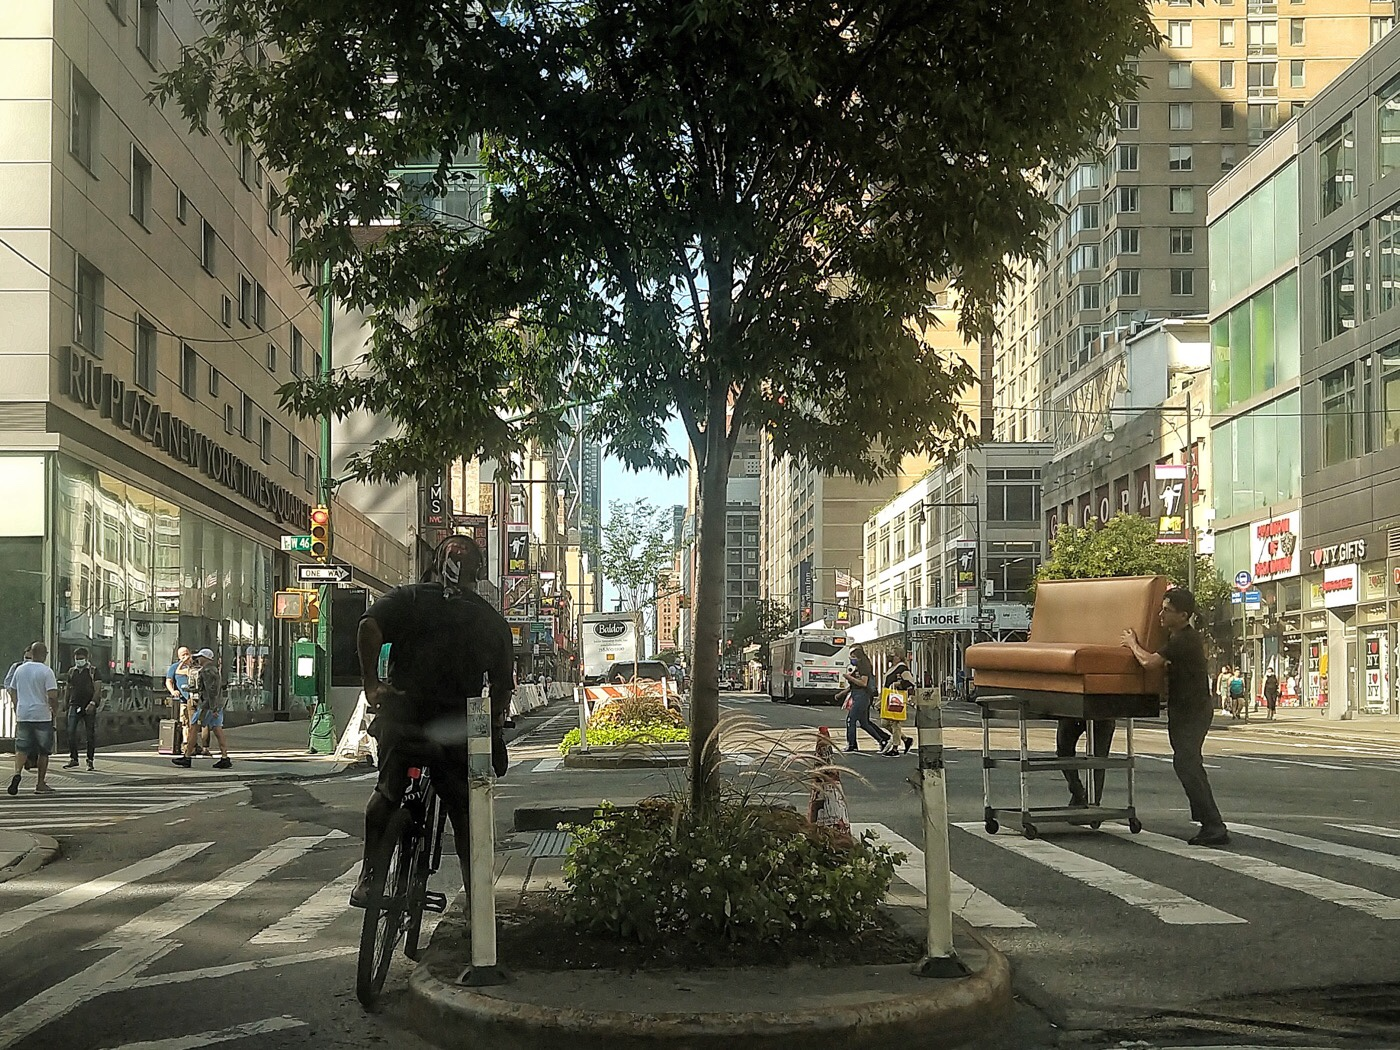 New York, Midtown Manhattan 8th Avenue and 46th Street